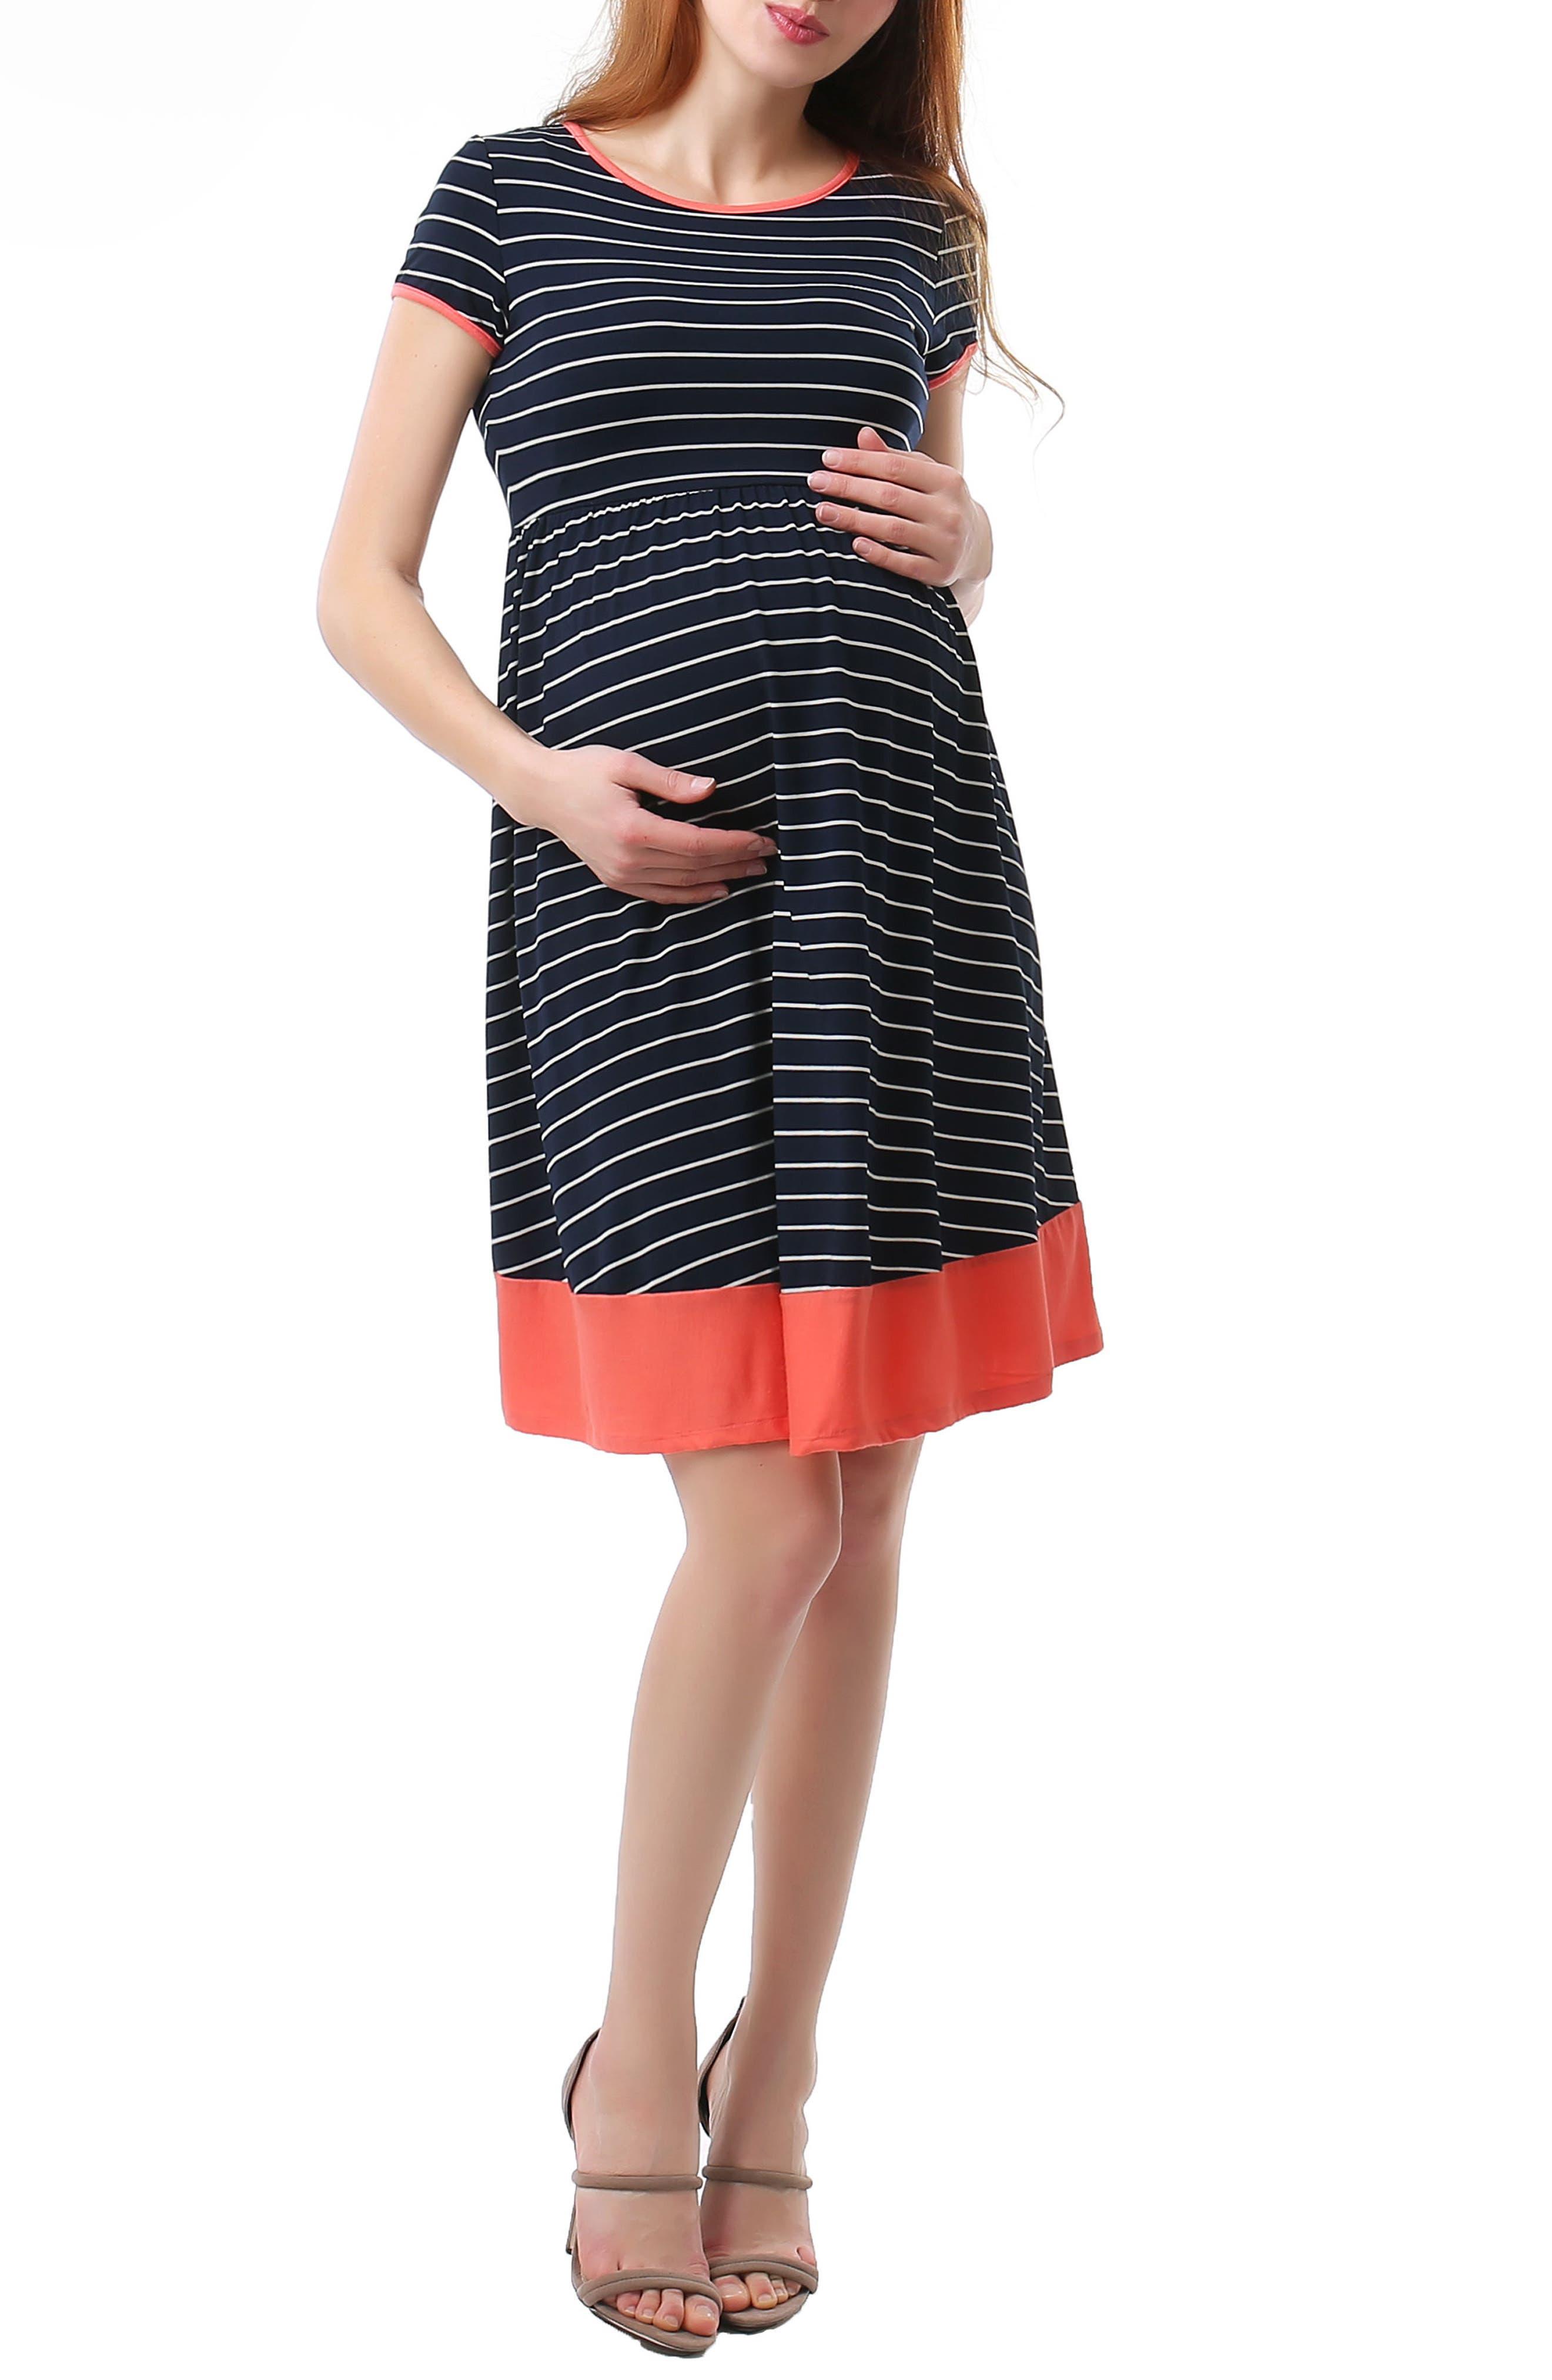 Alternate Image 1 Selected - Kimi and Kai Kira Stripe Maternity Skater Dress